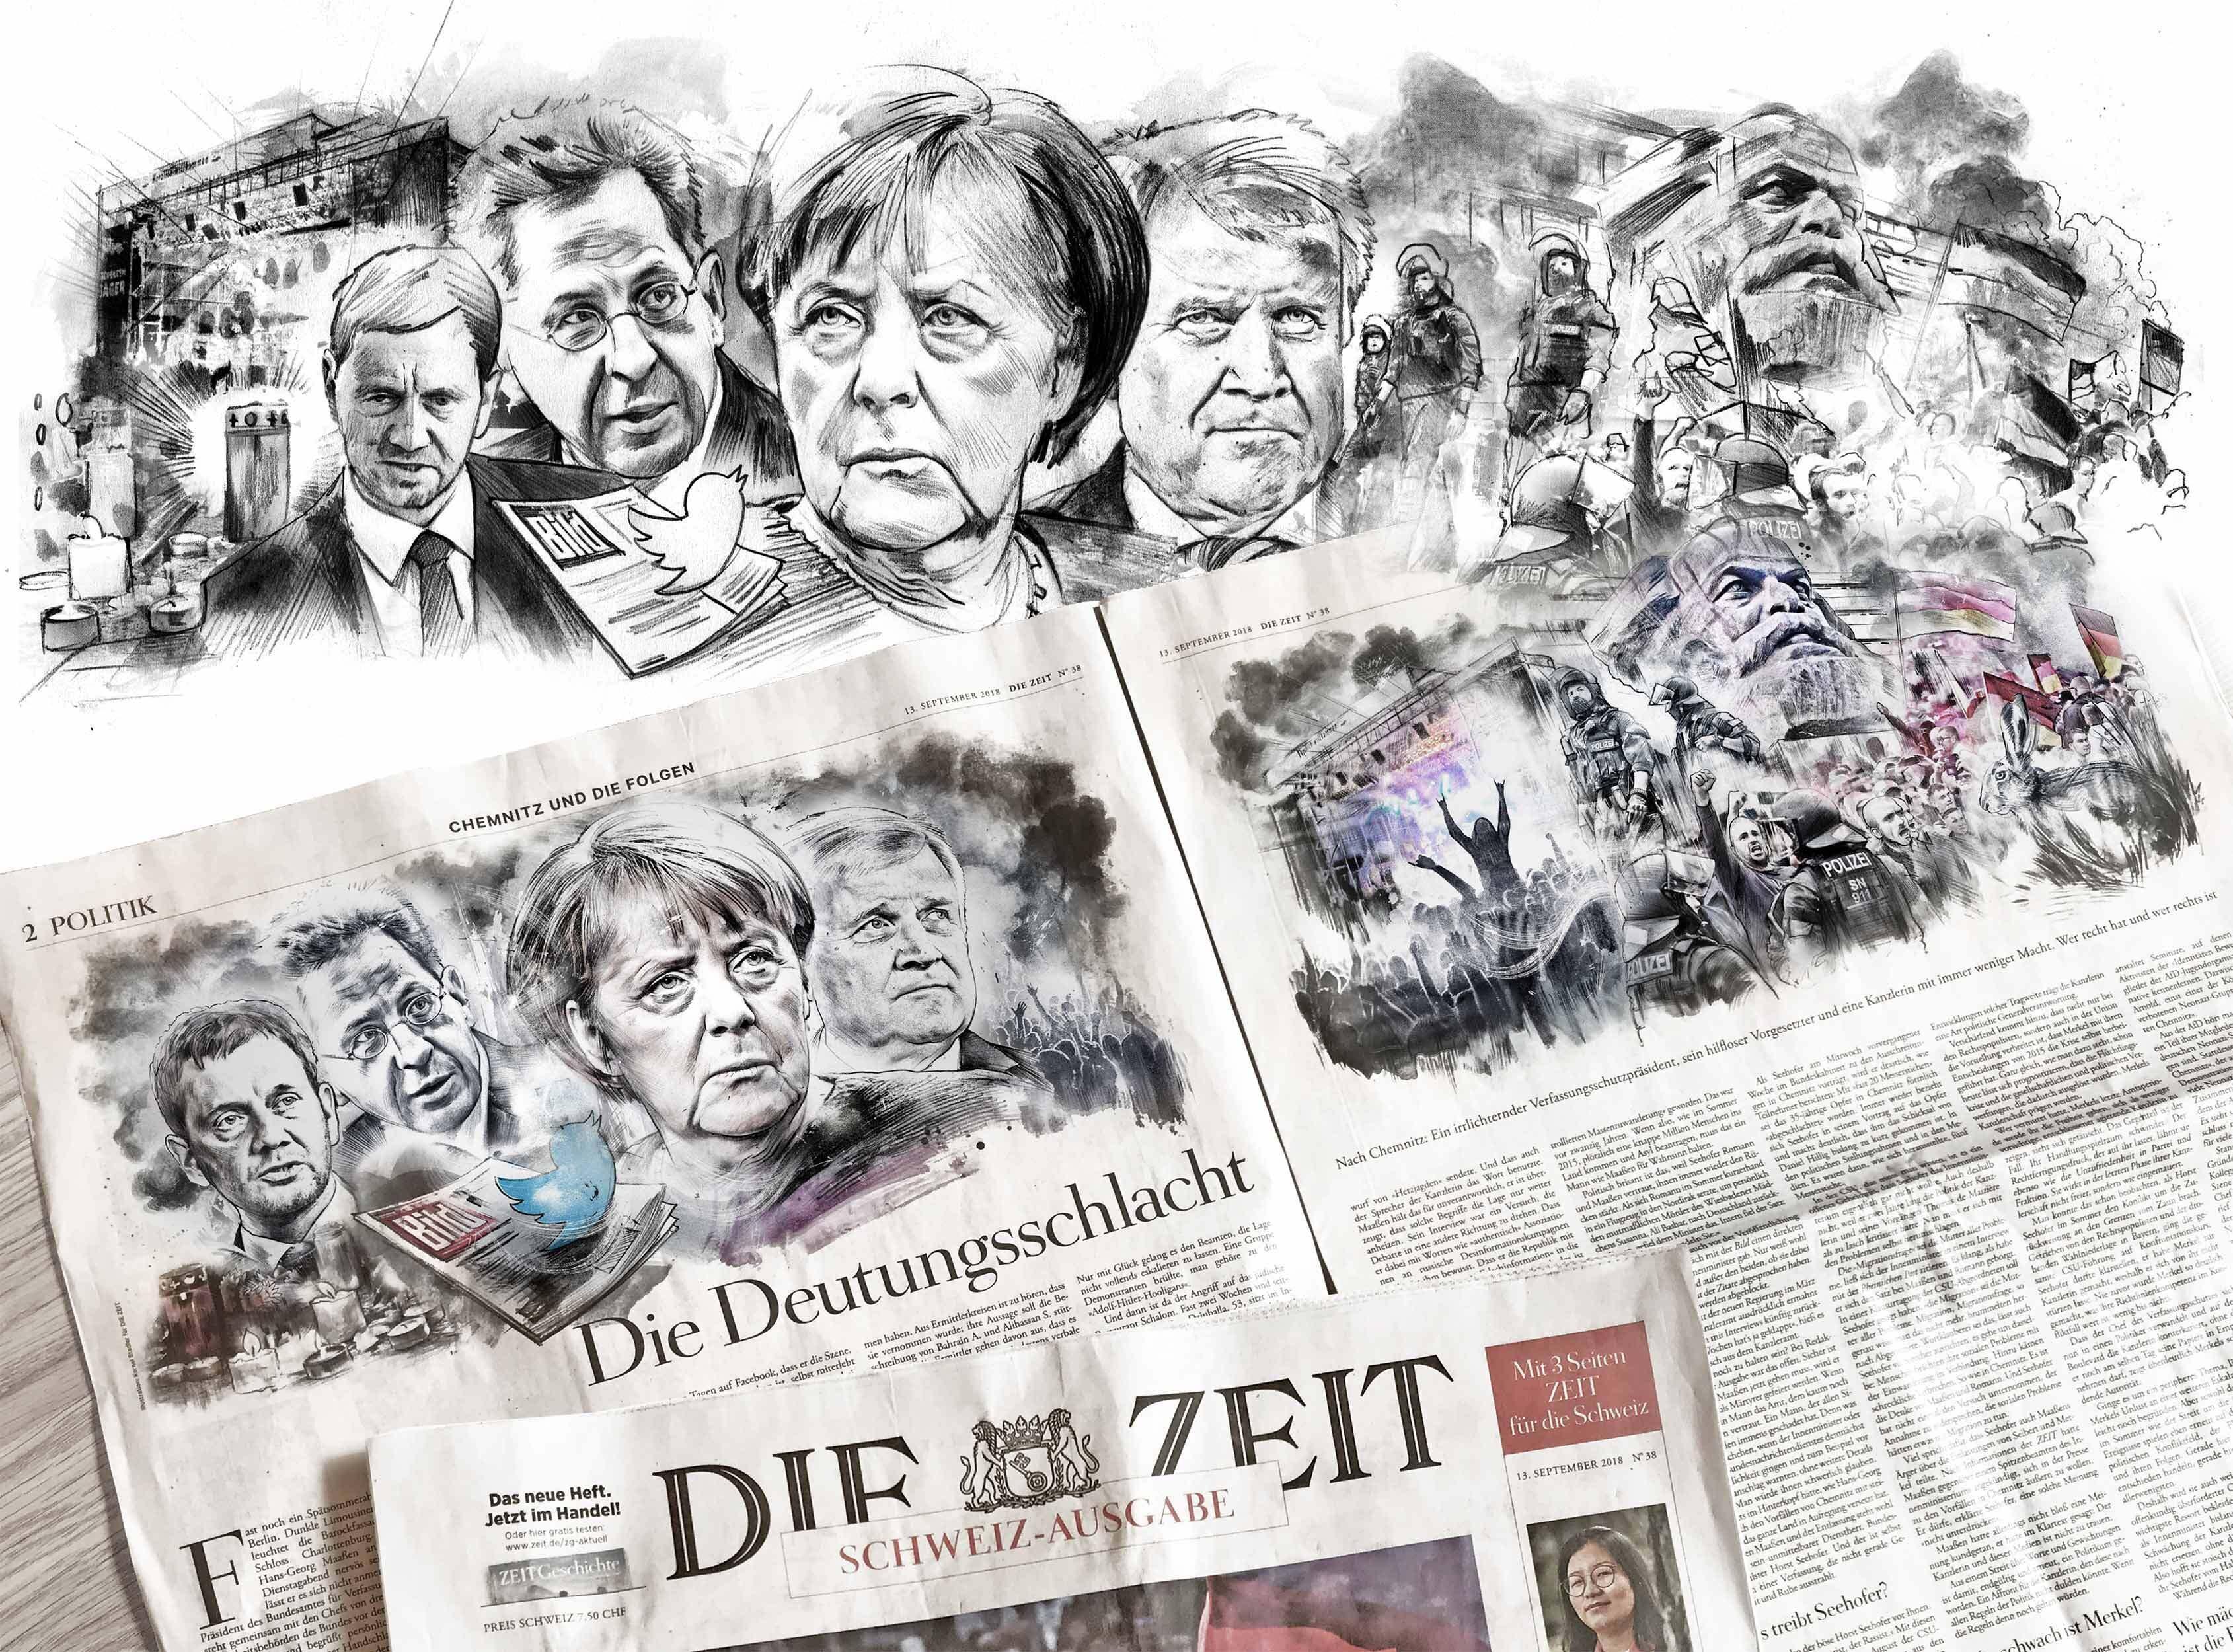 Die Zeit editorial illustration chemnitz - Kornel Illustration   Kornel Stadler portfolio